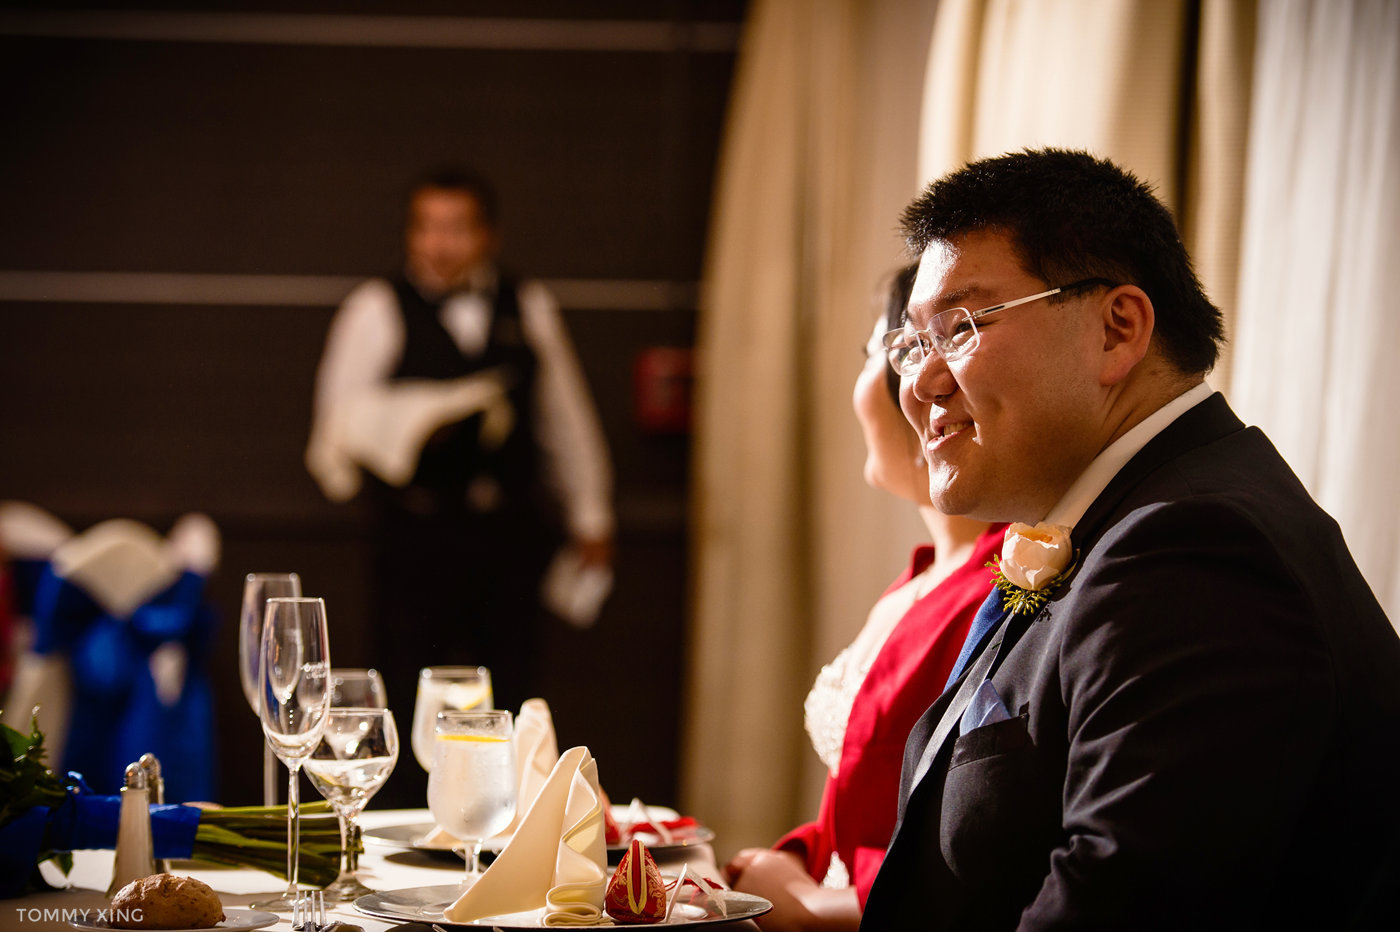 STANFORD MEMORIAL CHURCH WEDDING - Wenjie & Chengcheng - SAN FRANCISCO BAY AREA 斯坦福教堂婚礼跟拍 - 洛杉矶婚礼婚纱照摄影师 Tommy Xing Photography176.jpg